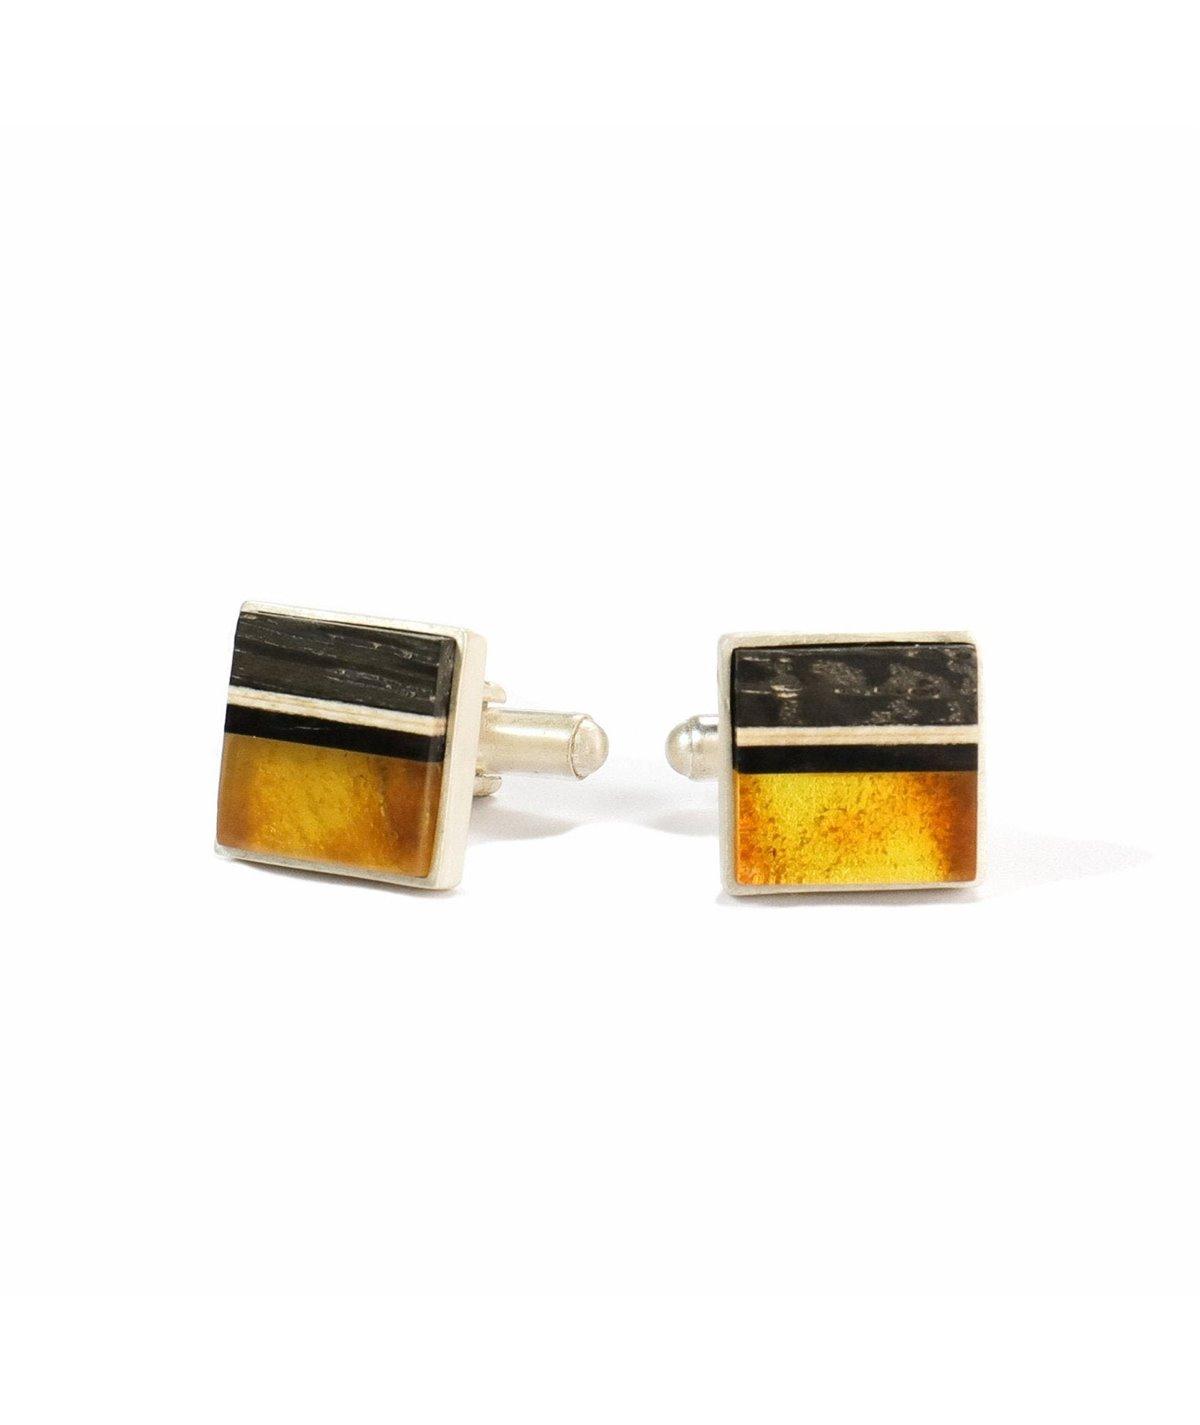 Cufflinks of baltic amber, wood and sterling silver, handmade by Amberwood Marta Wlodarska